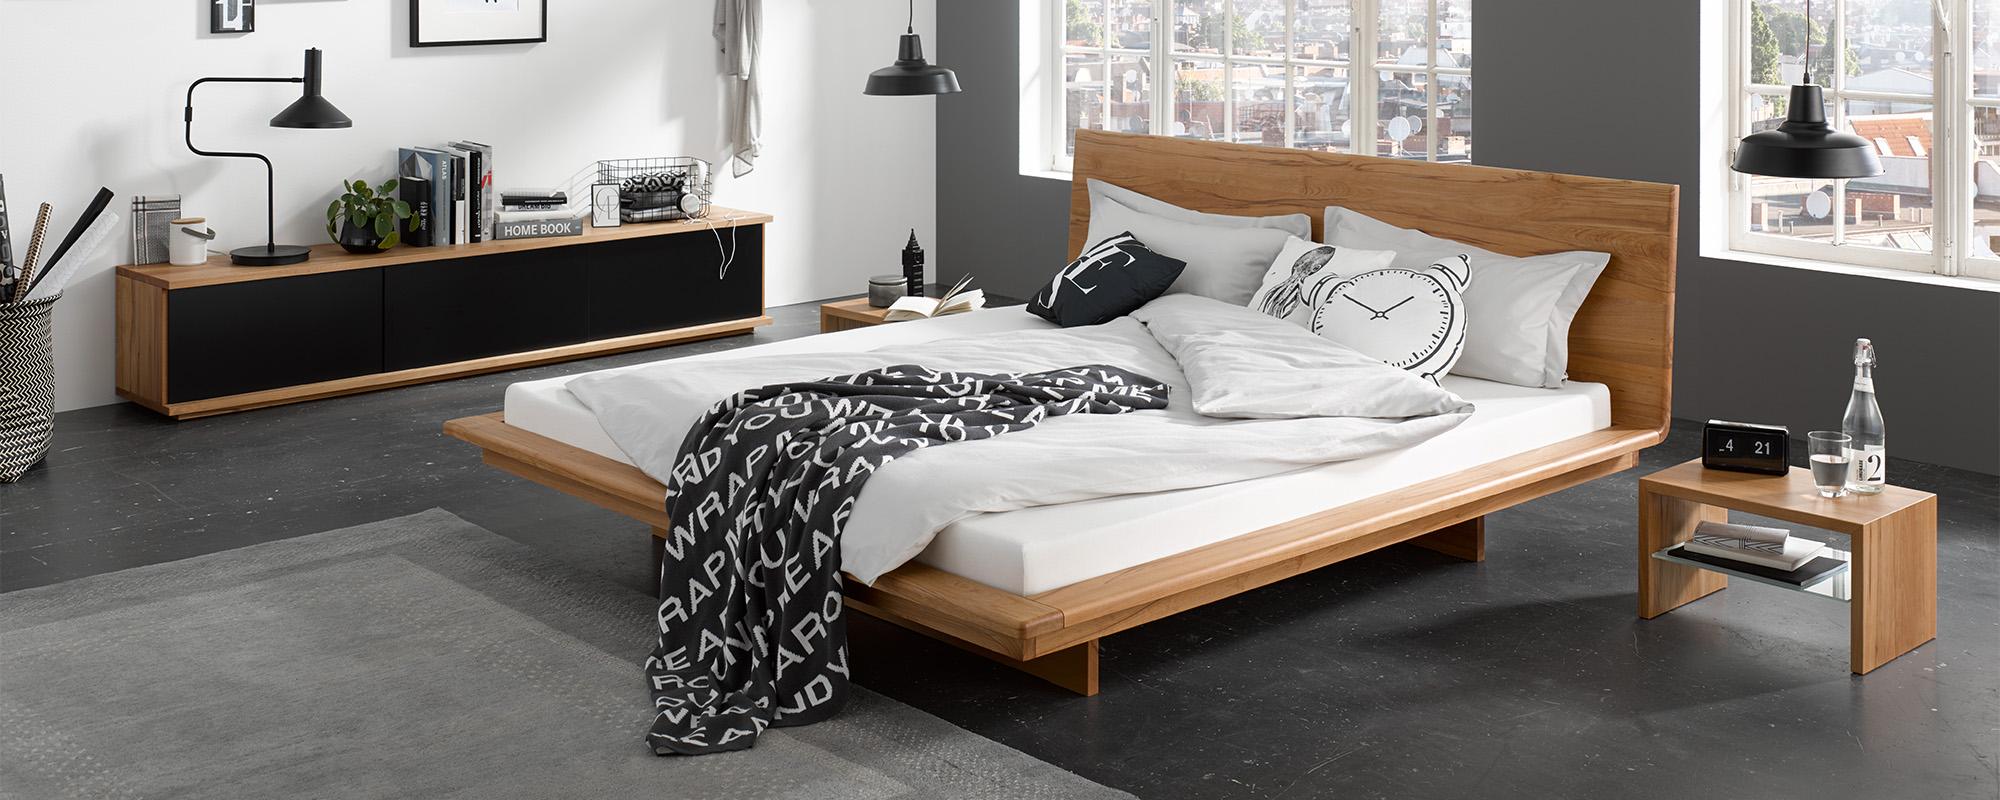 Full Size of Bett Matis Aus Massivholz Jensen Betten Weiß 180x200 Ausklappbar 120x190 Ikea 160x200 Teenager Köln Jabo Mit Matratze Hohem Kopfteil Schubladen Landhaus Bett Japanisches Bett